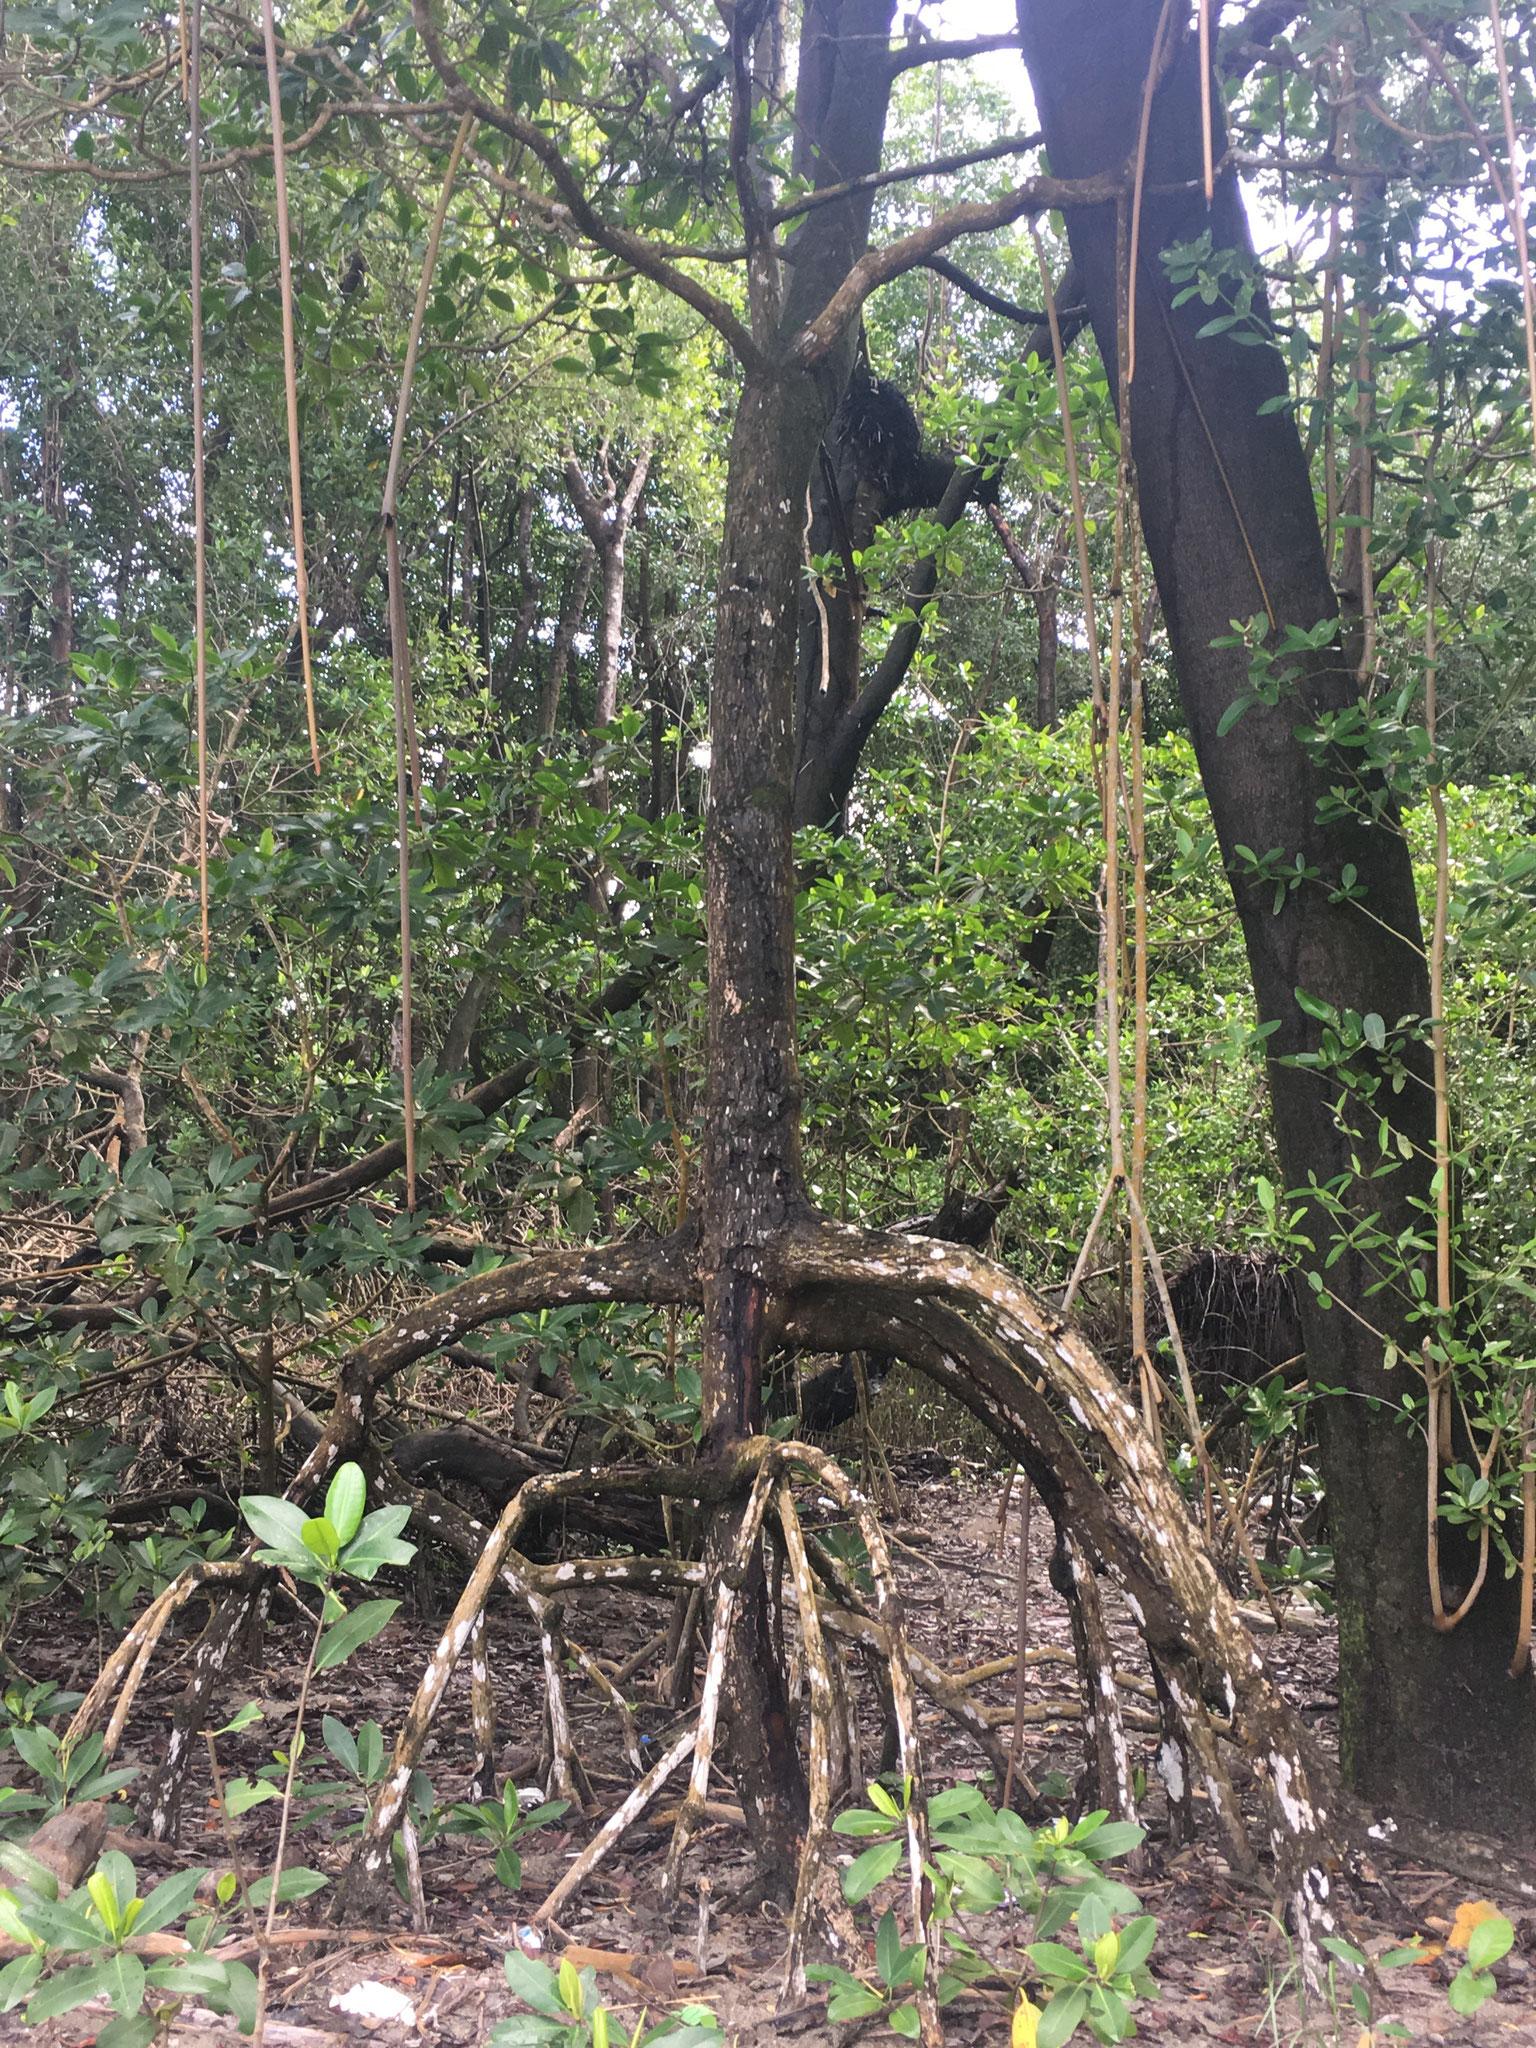 Bäume schlagen Wurzeln an der Oberfläche - mystisch...